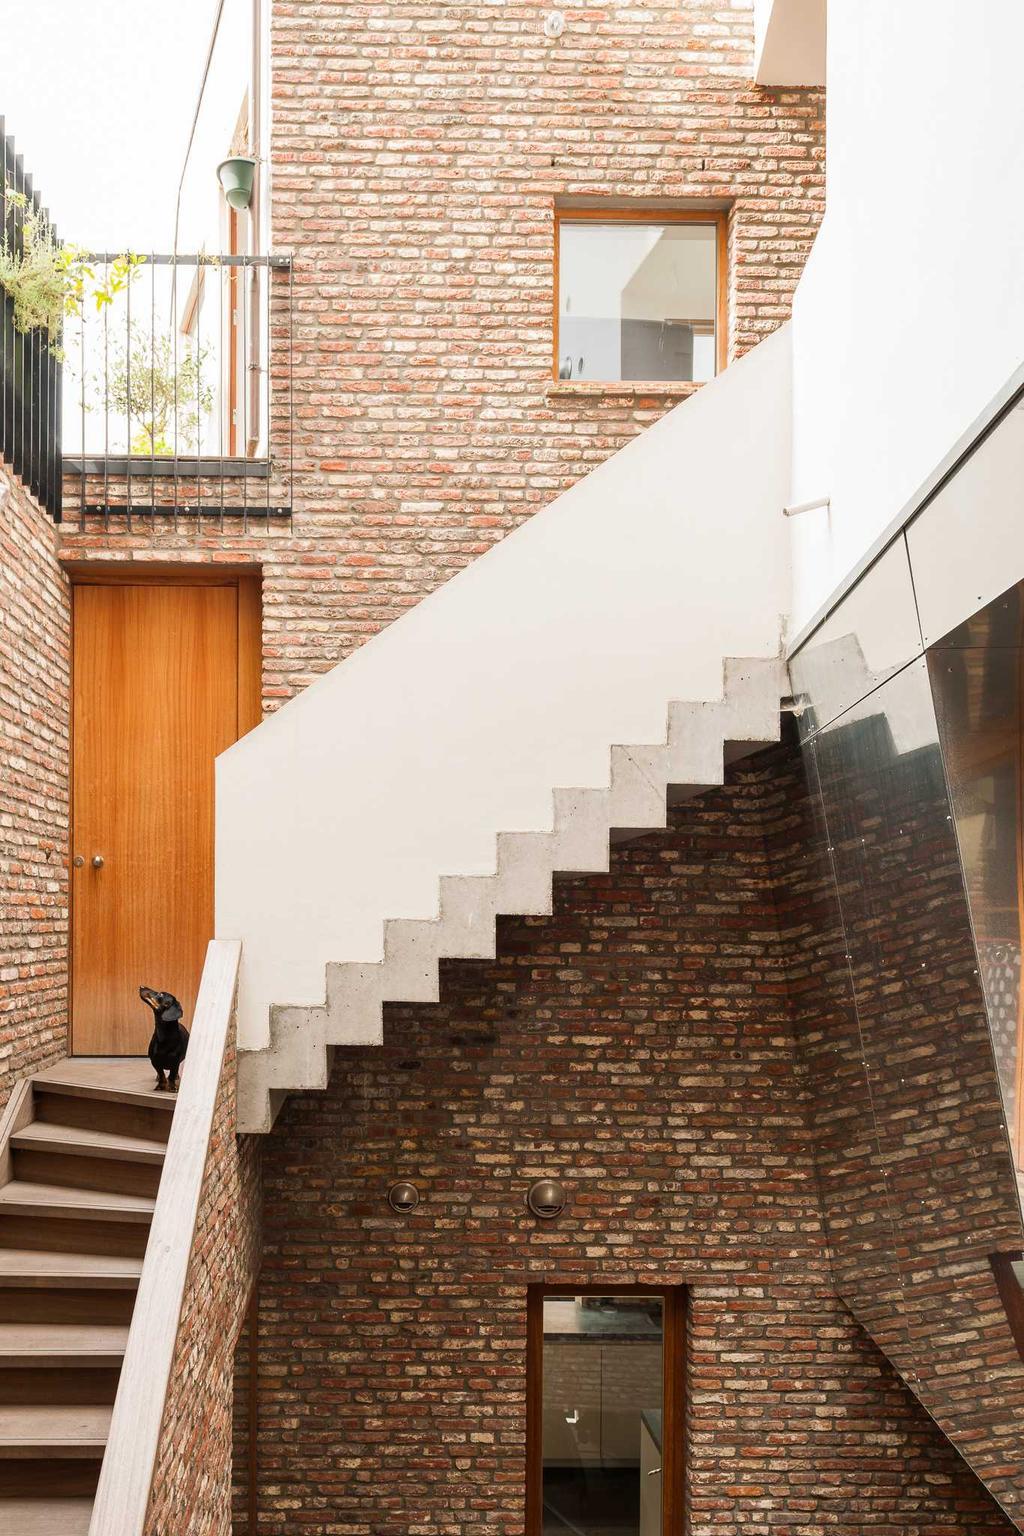 patio escalier